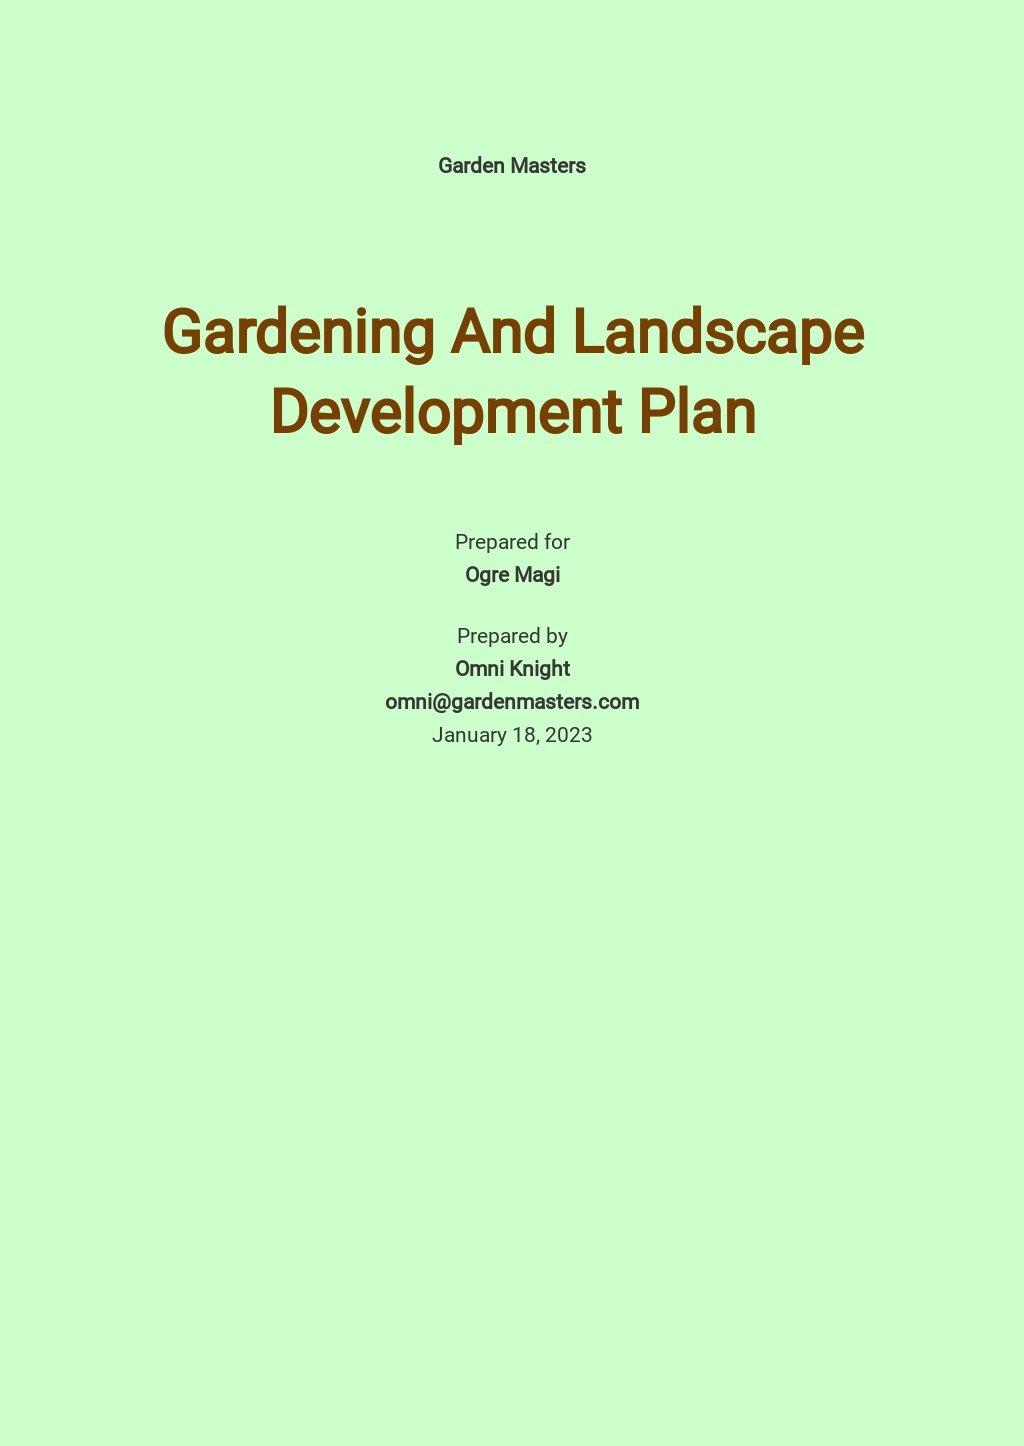 Gardening And landscape Development Plan Template